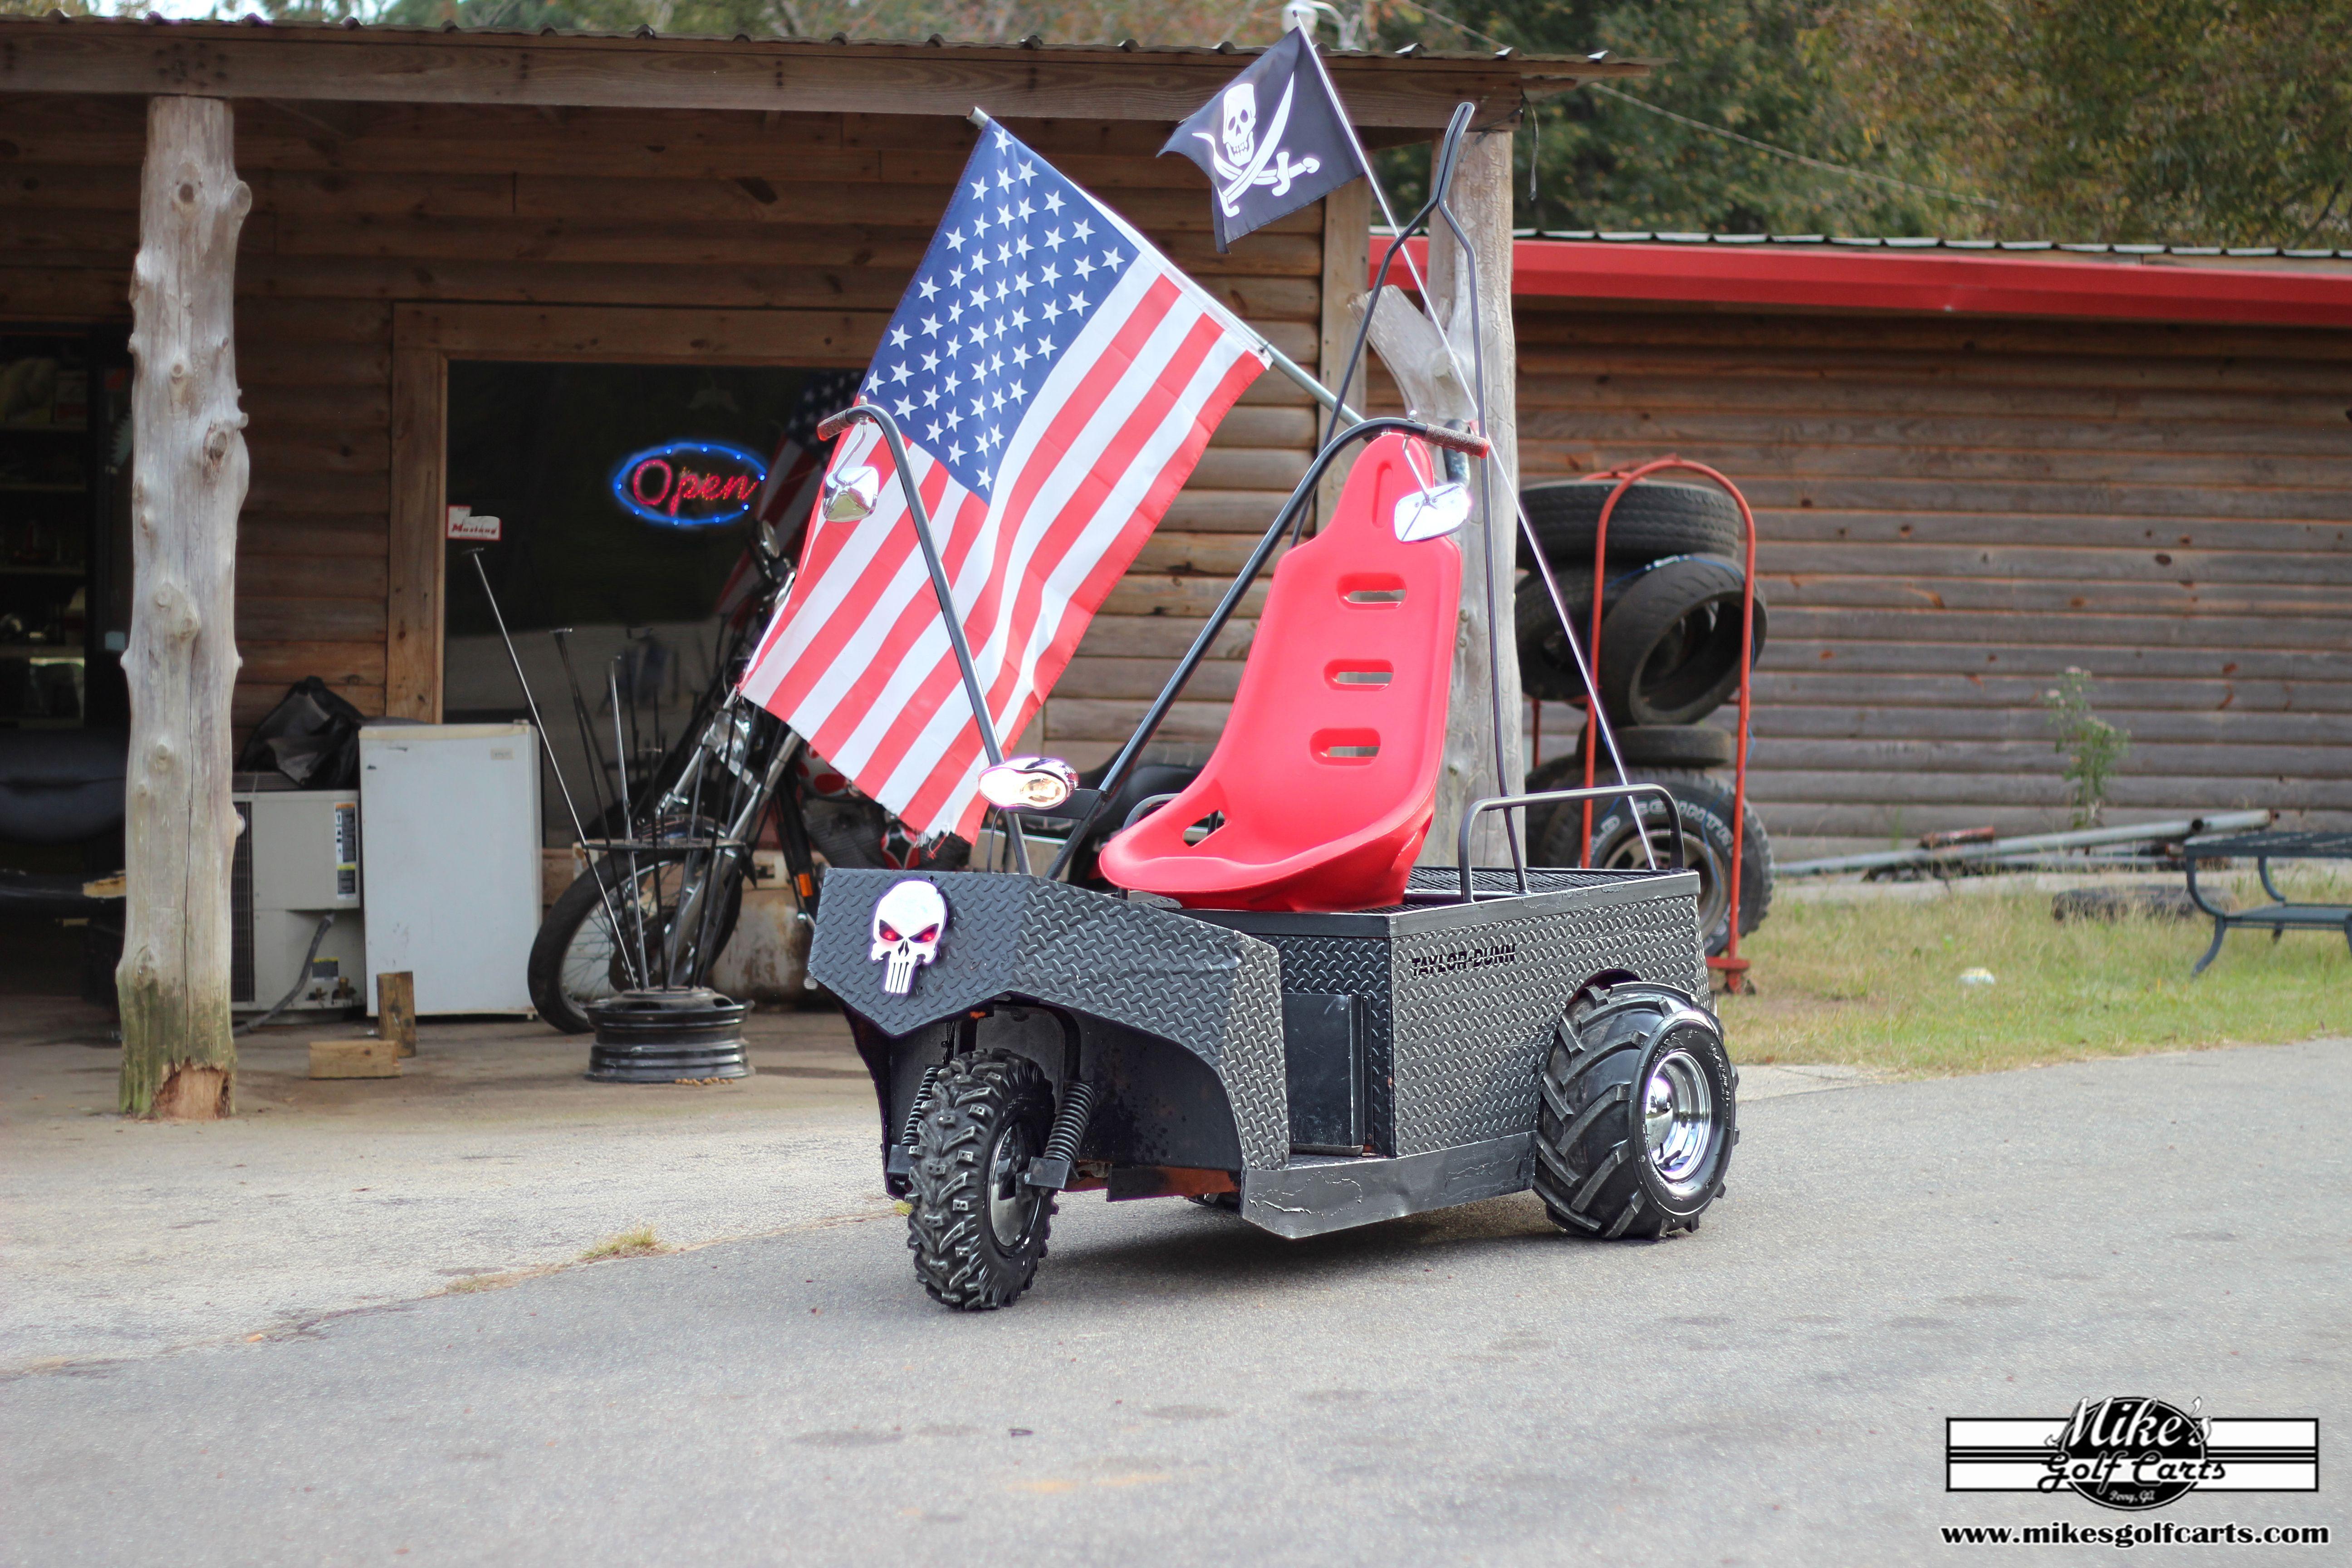 Our Custom Cushman Golf Cart Trike At Motorcycle Shop Previously A Warehouse Golf Cart Converted To An Ape Hange Custom Golf Carts Motorcycle Shop Golf Carts